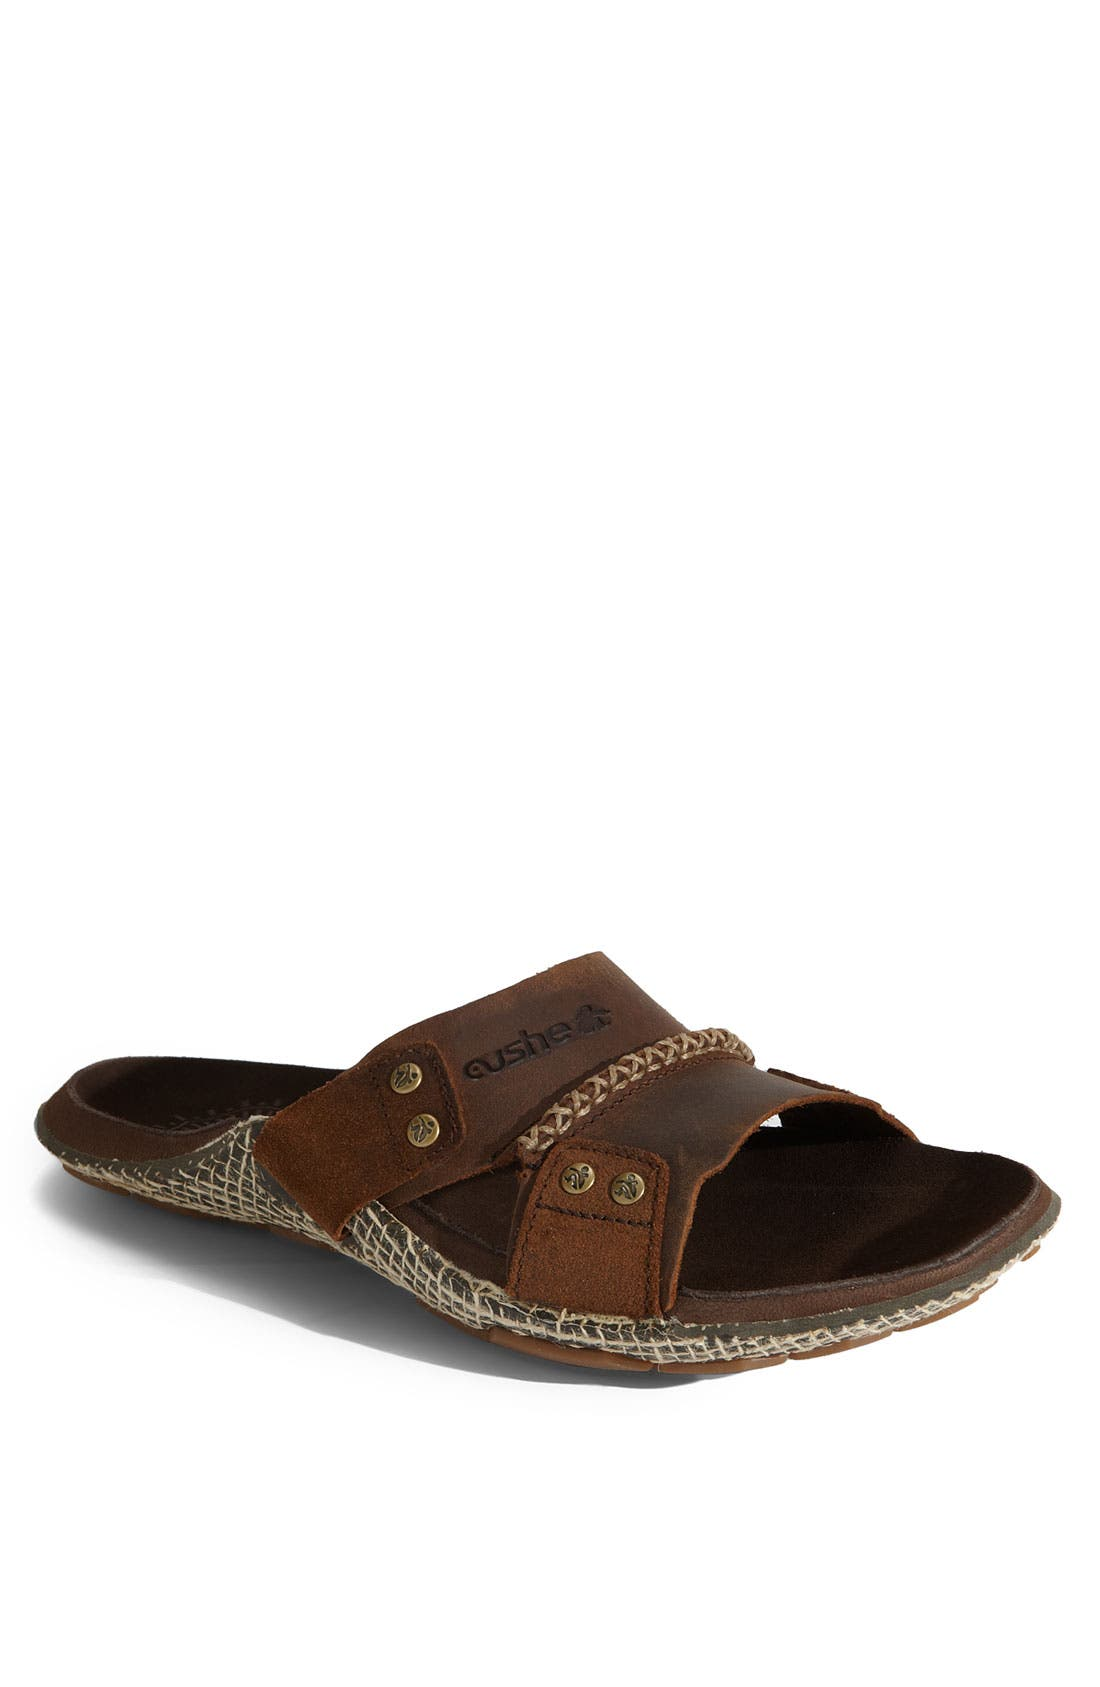 Alternate Image 1 Selected - Cushe 'Manuka' Slide Sandal